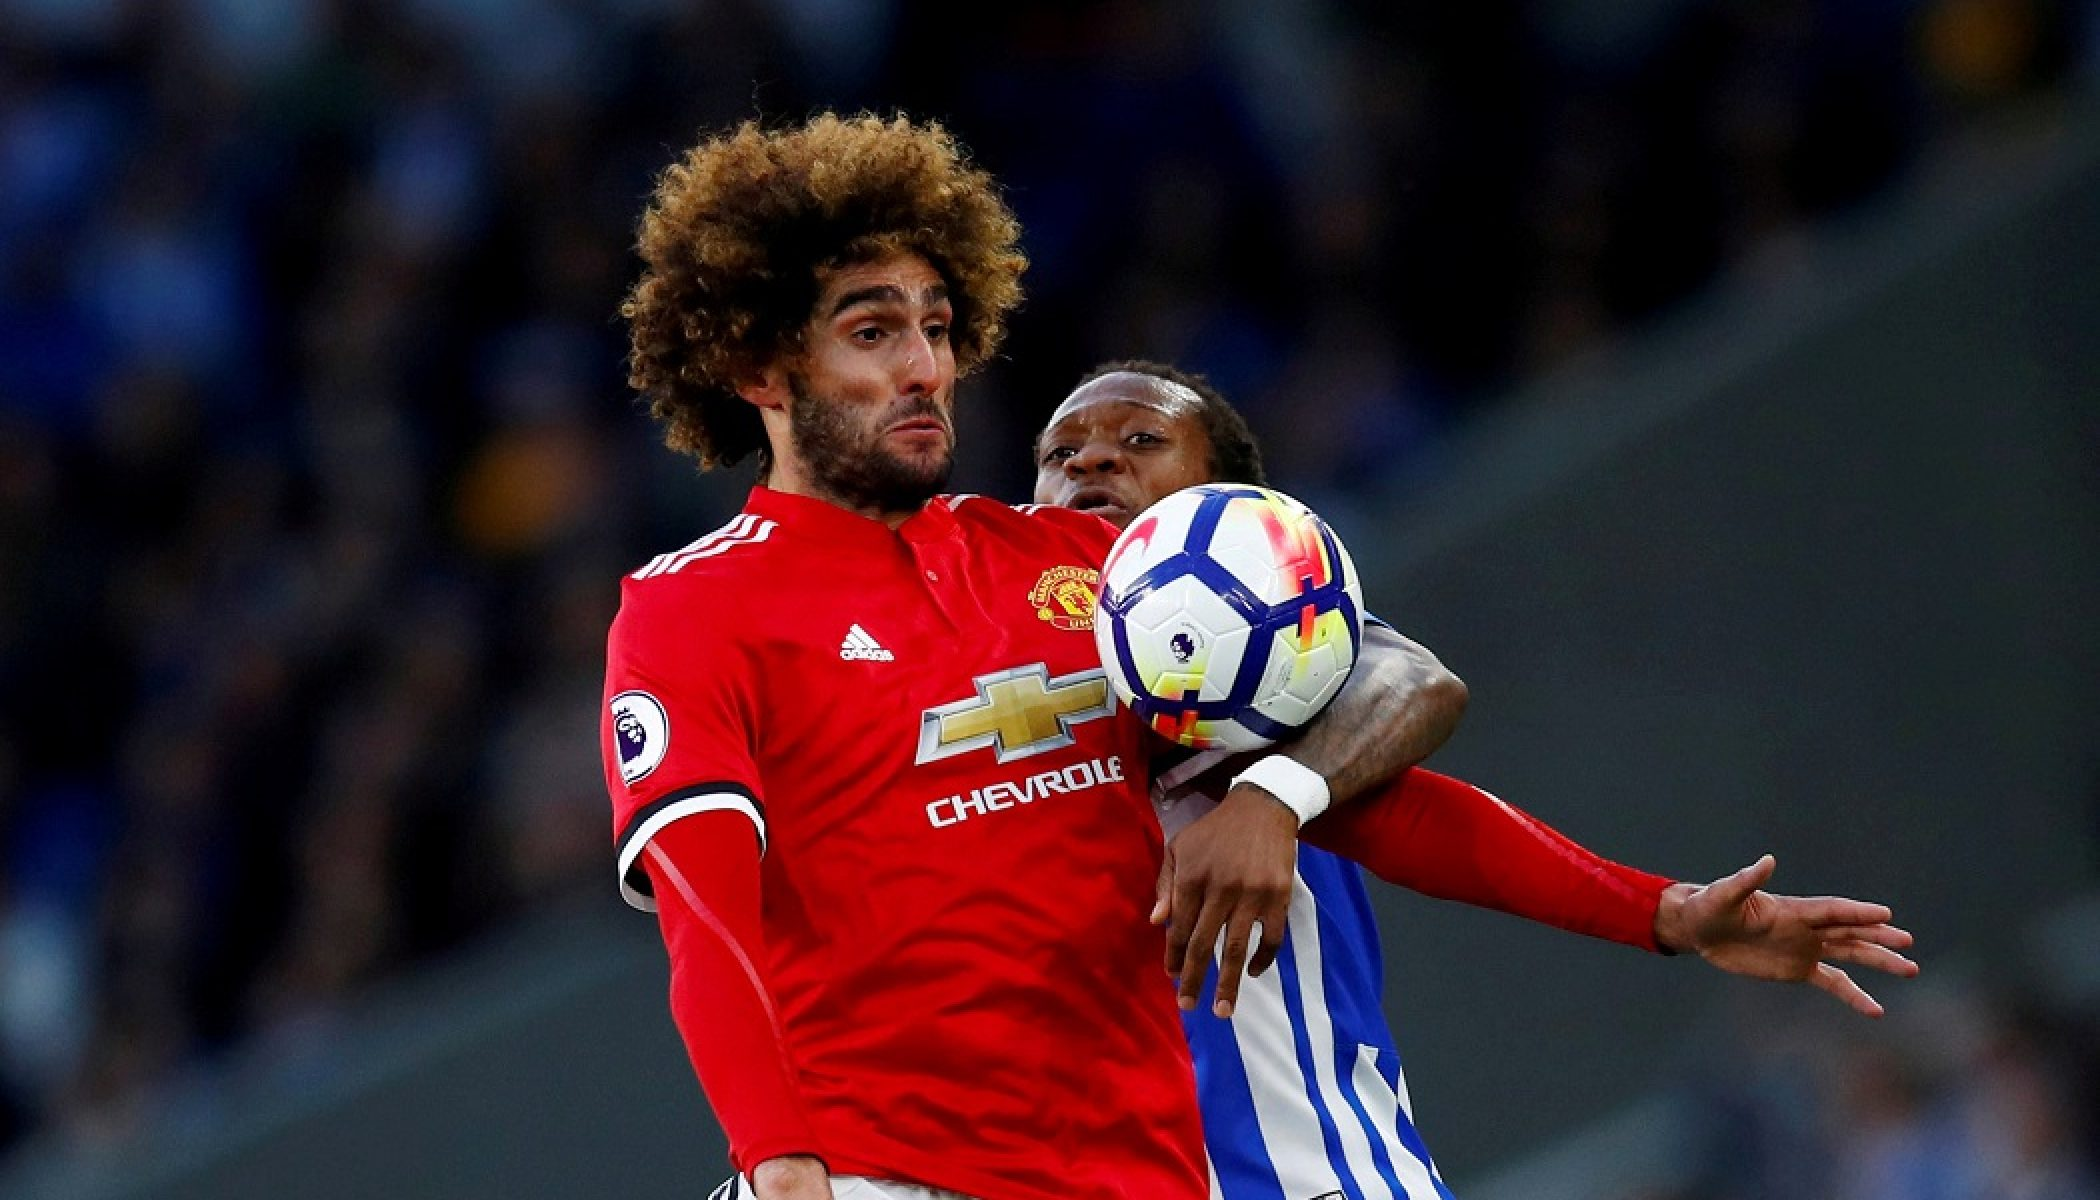 Manchester United Unveil Kohler As Sleeves Partner